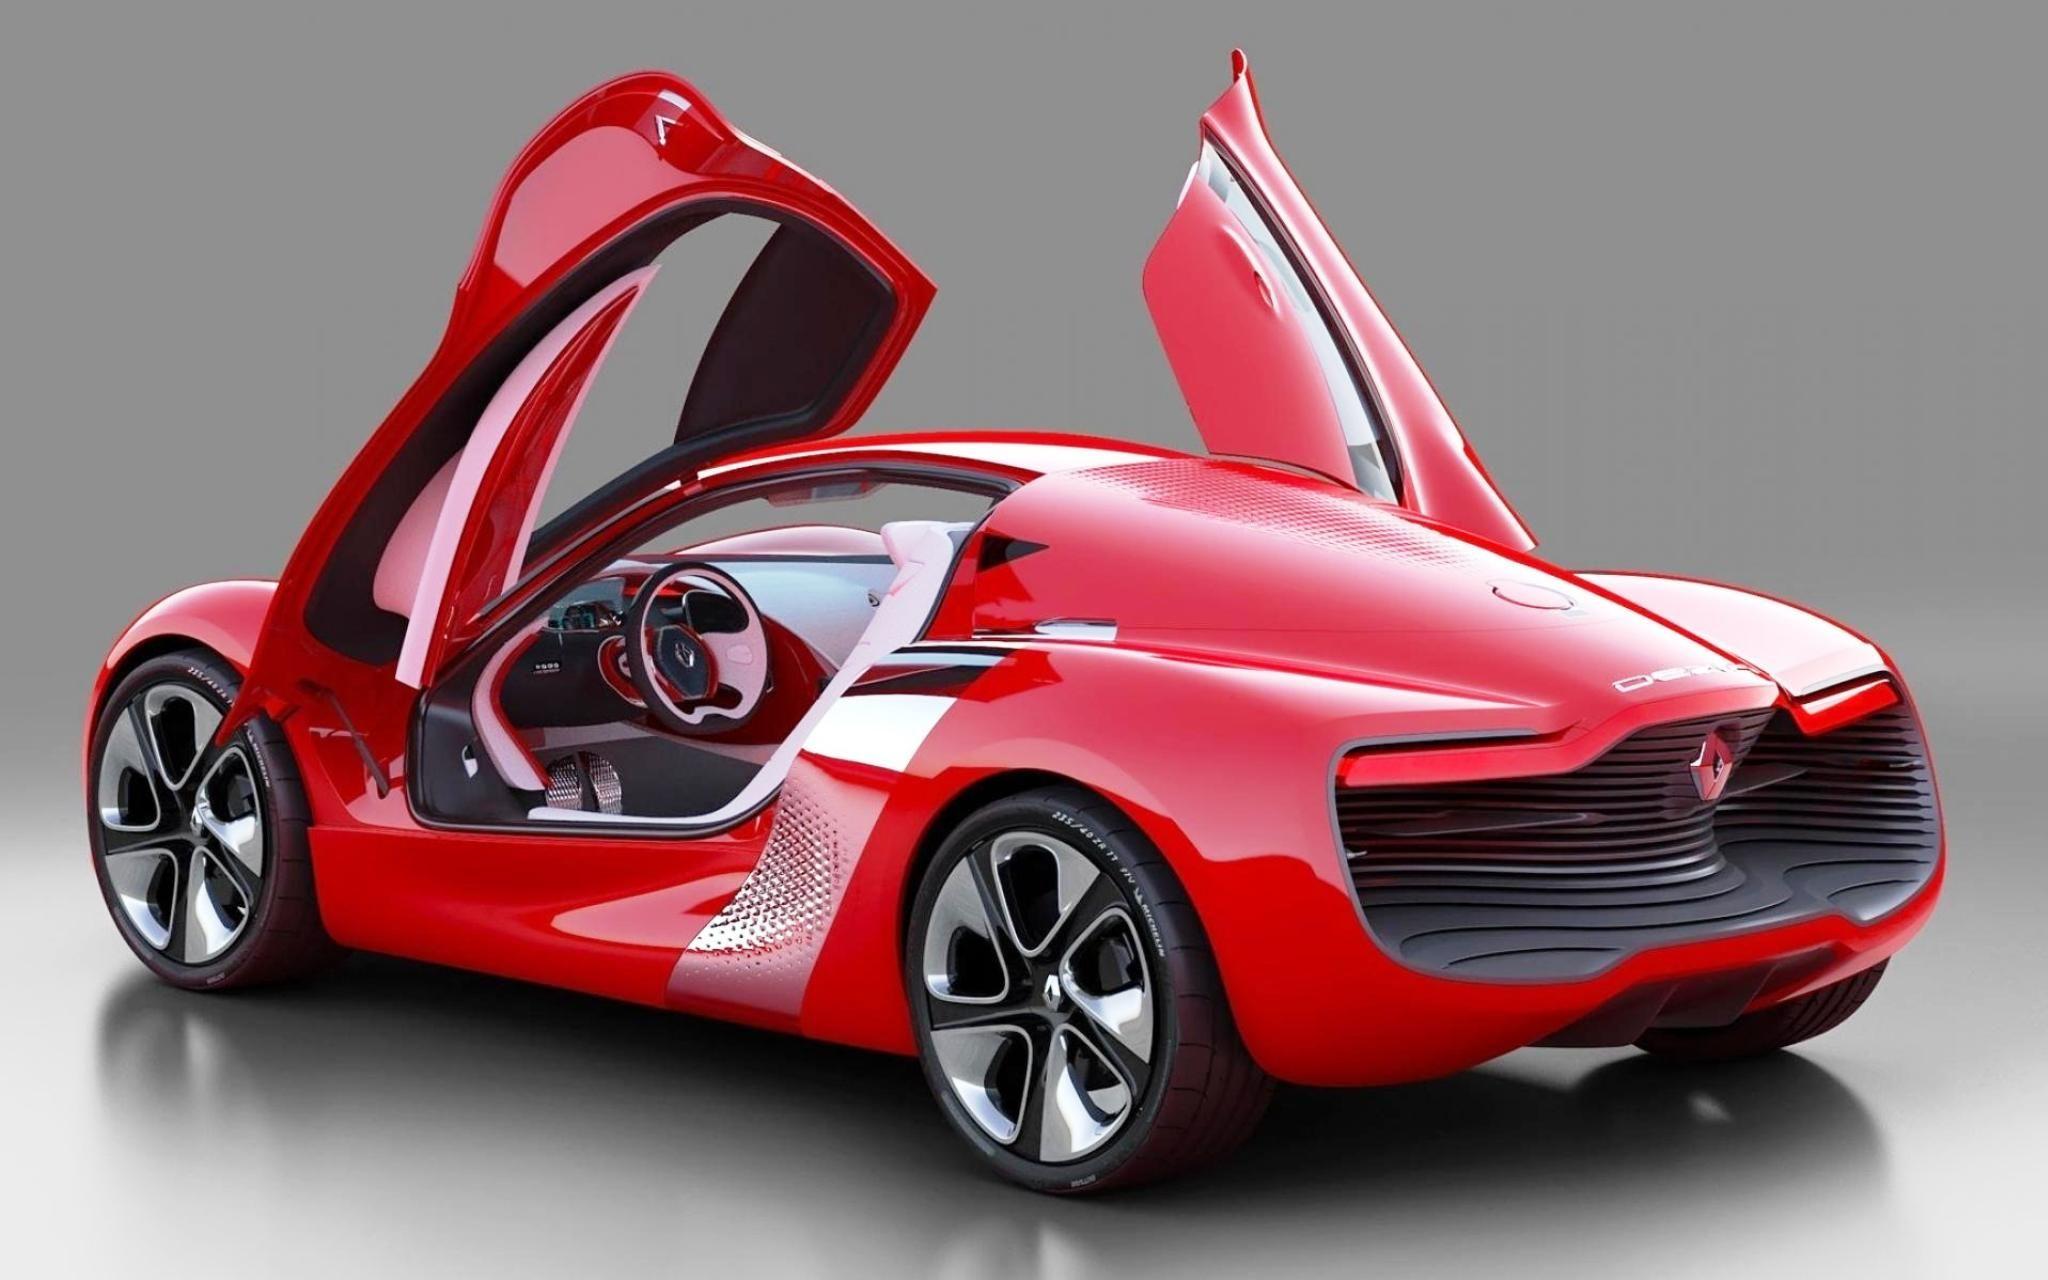 Renault Dezir Red Car HD Wallpaper Car Pixo Concept